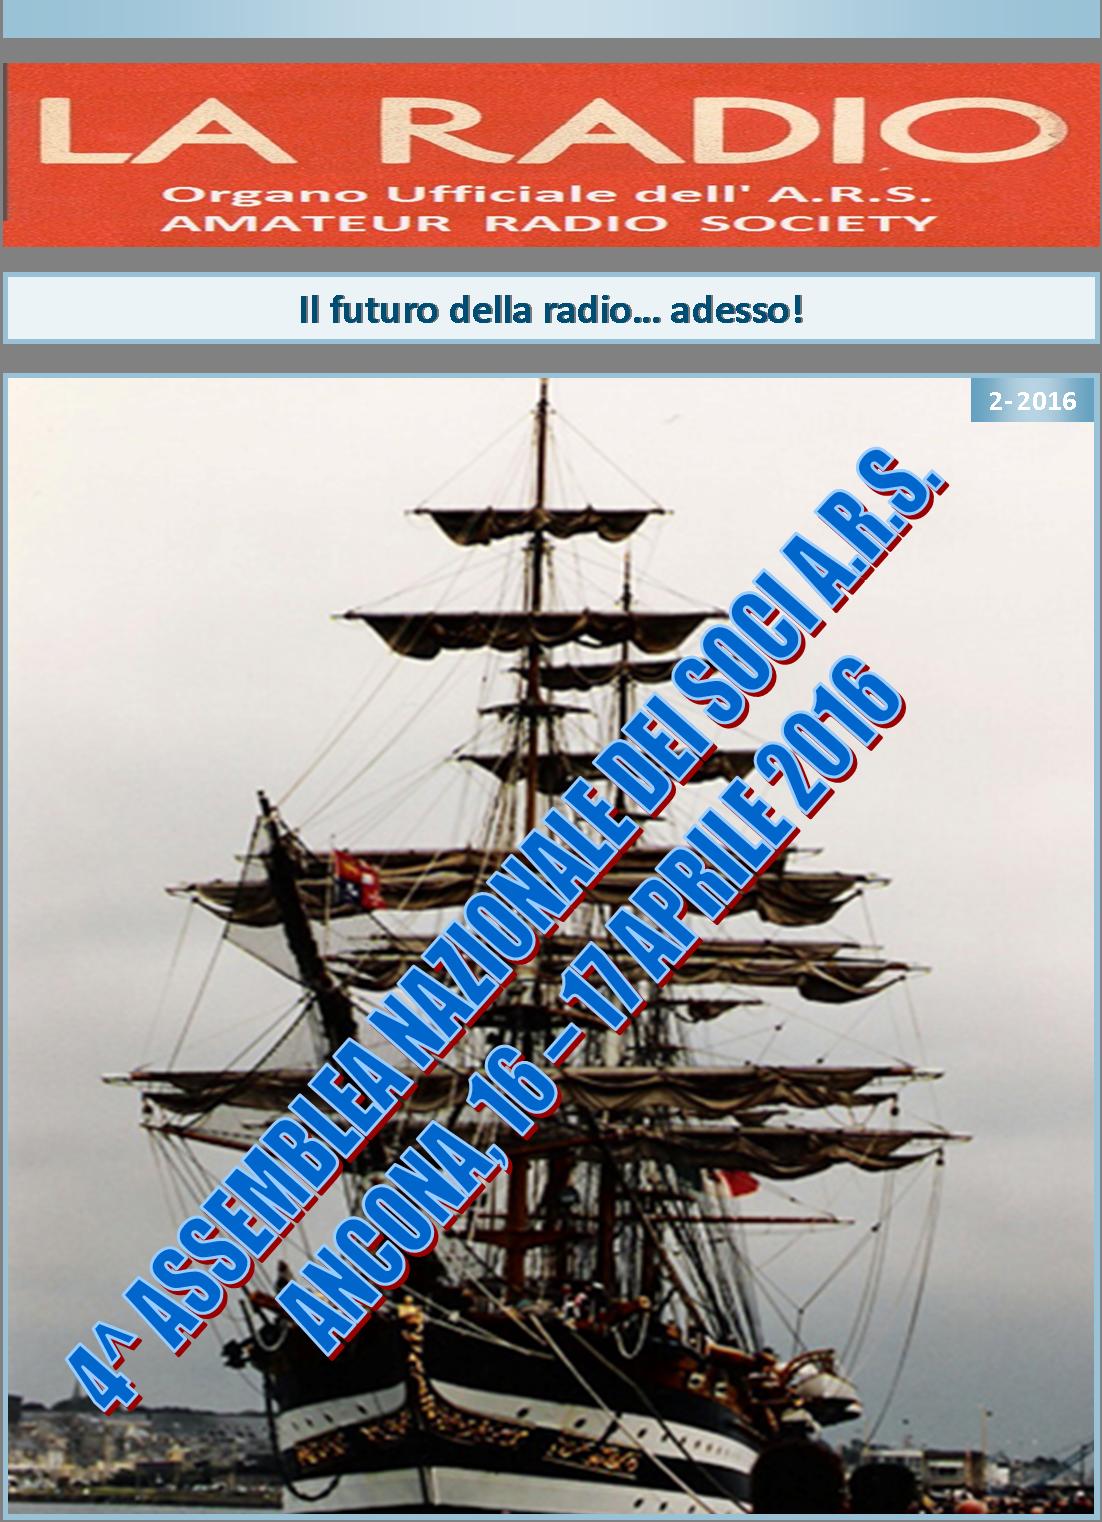 Prima pagina LA RADIO 2-2016